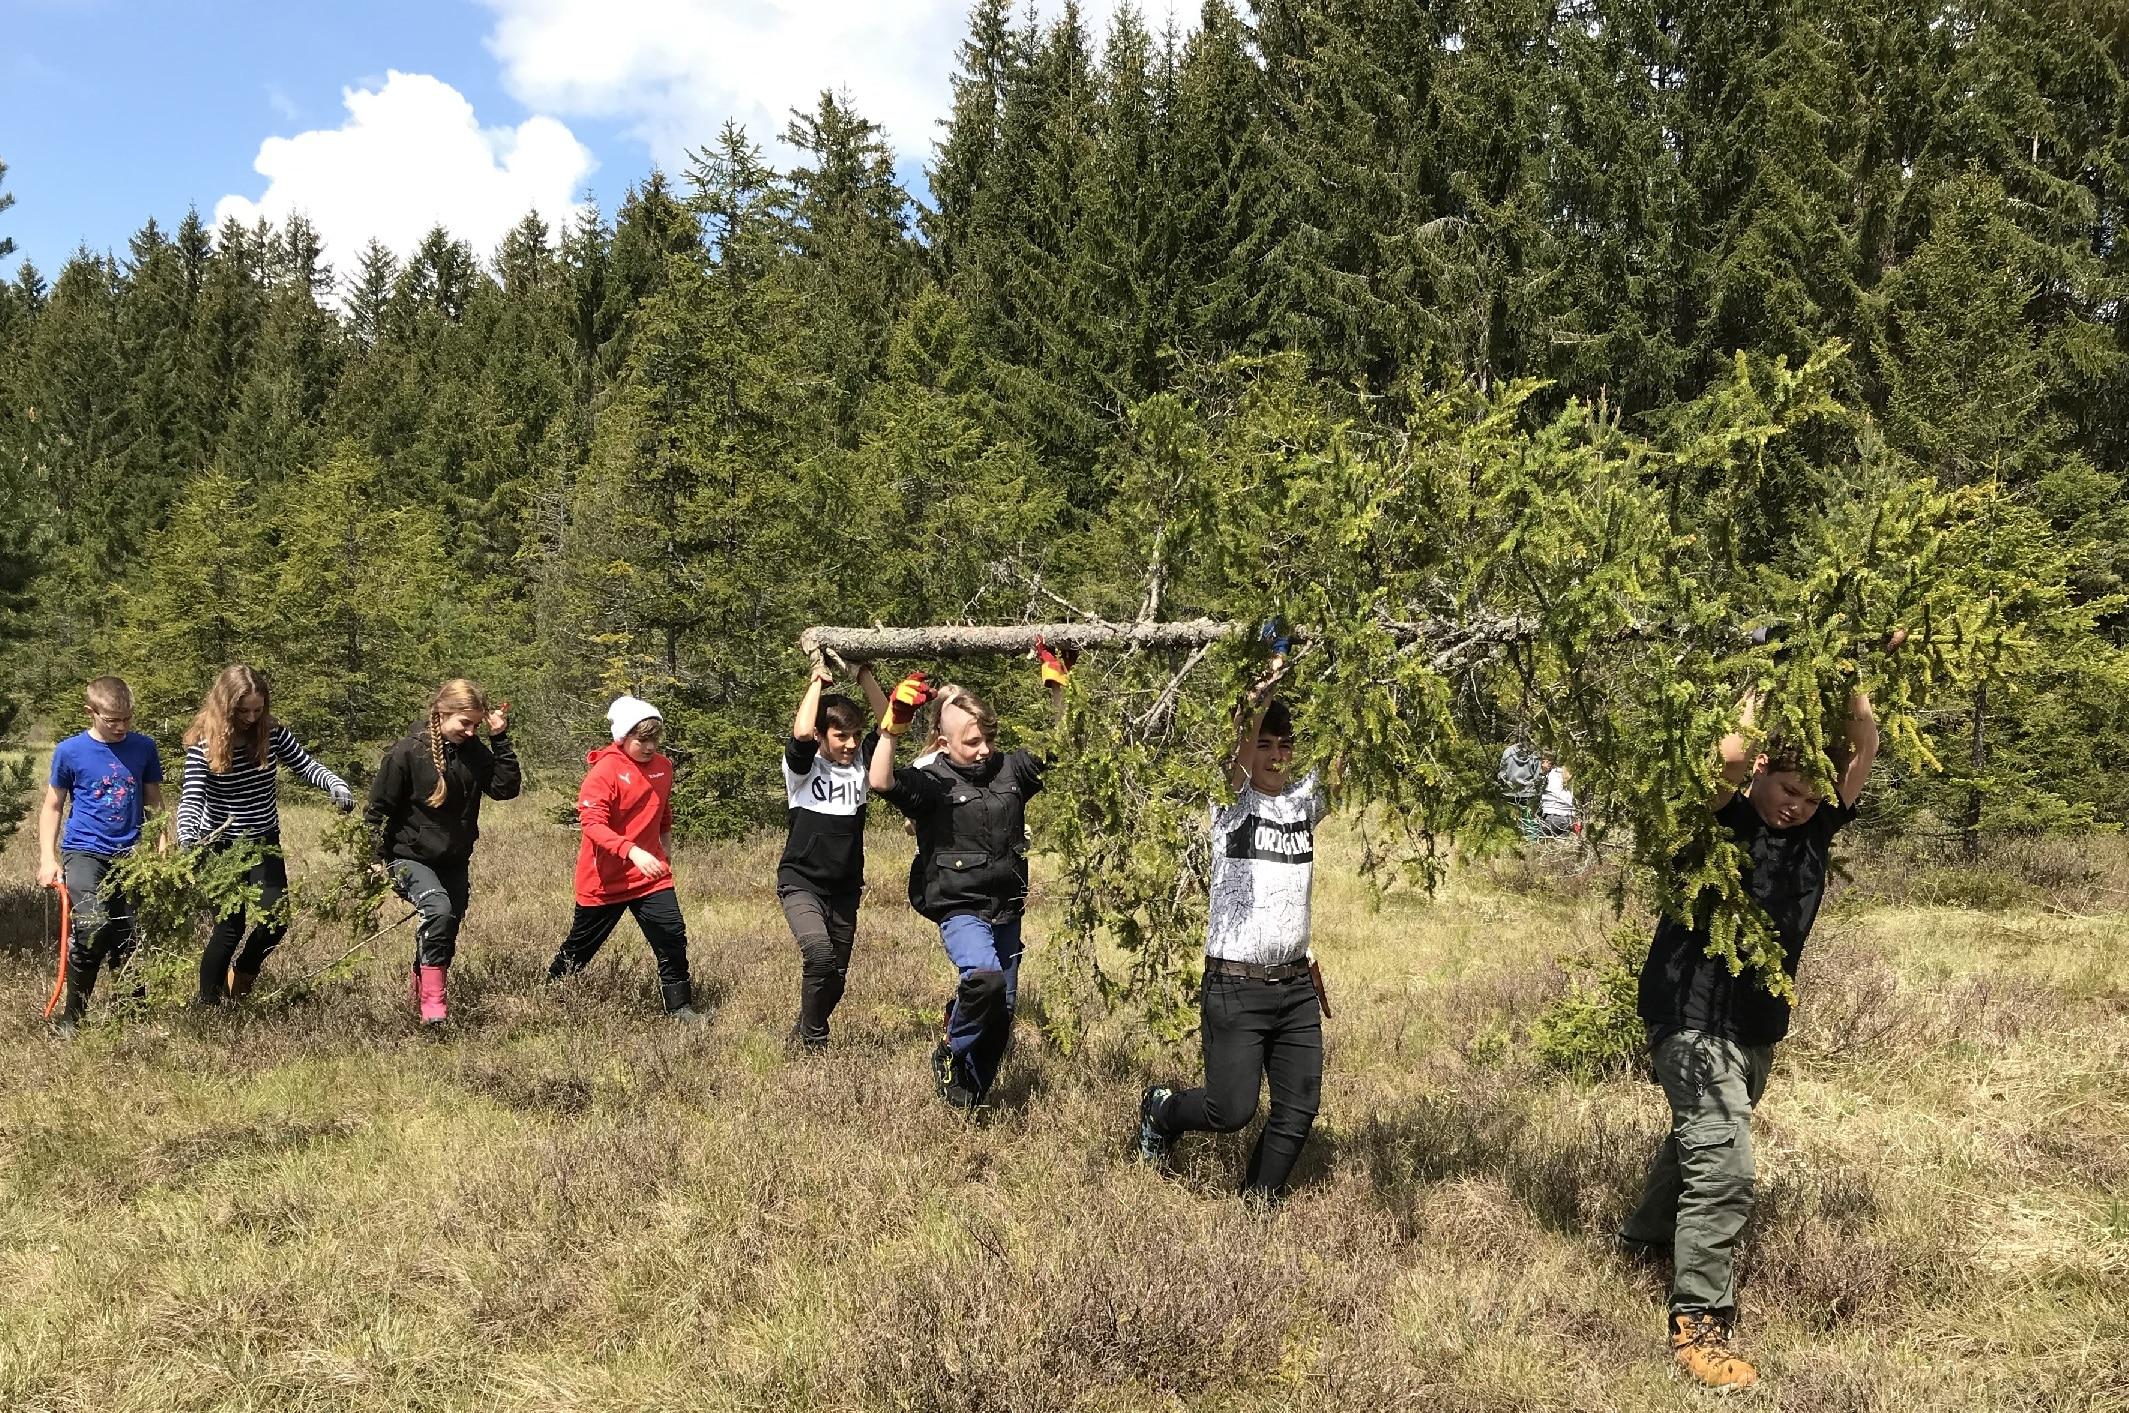 Natur ist Klasse: Natura 2000-Klassenzimmer geht in Regie des Biosphärengebiets Schwarzwald über